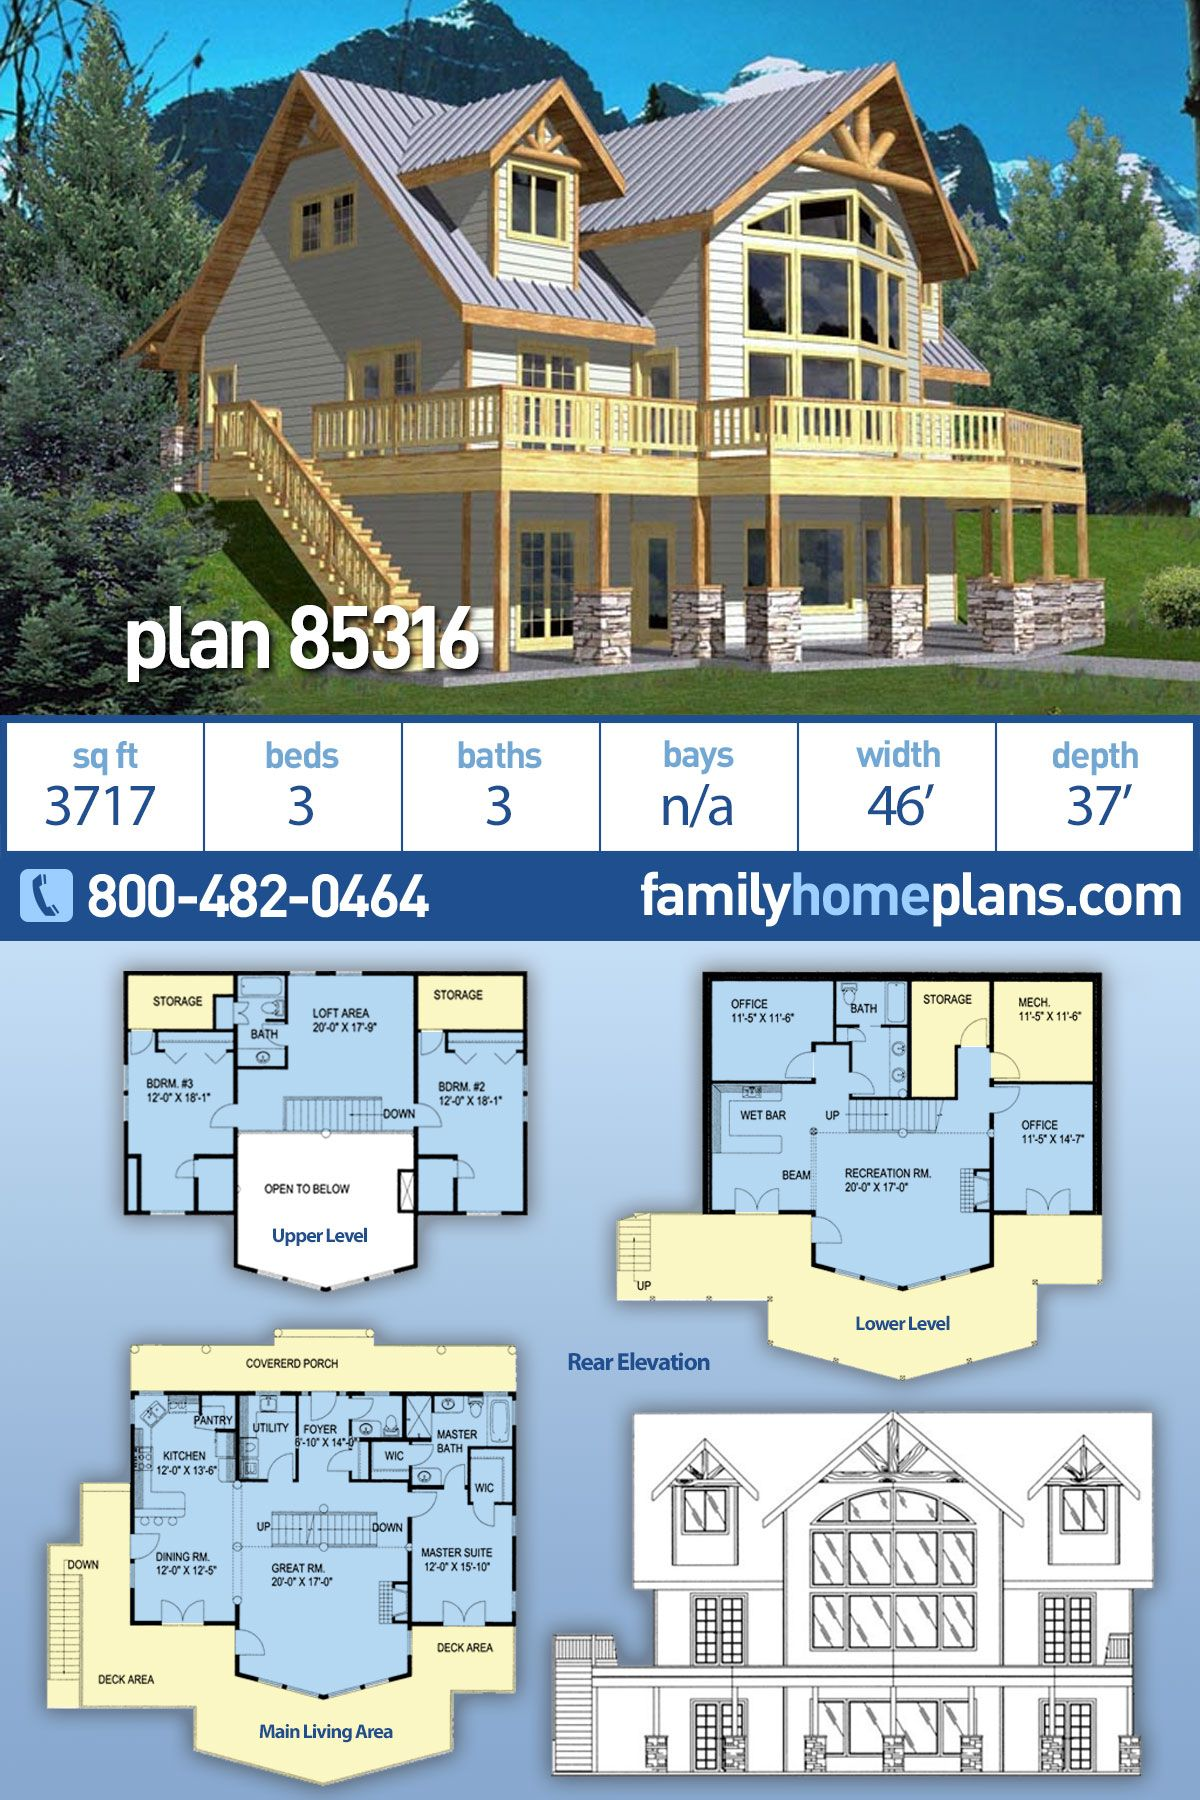 Coastal Style House Plan 85316 With 3 Bed 3 Bath Coastal House Plans House Plans Lake House Plans